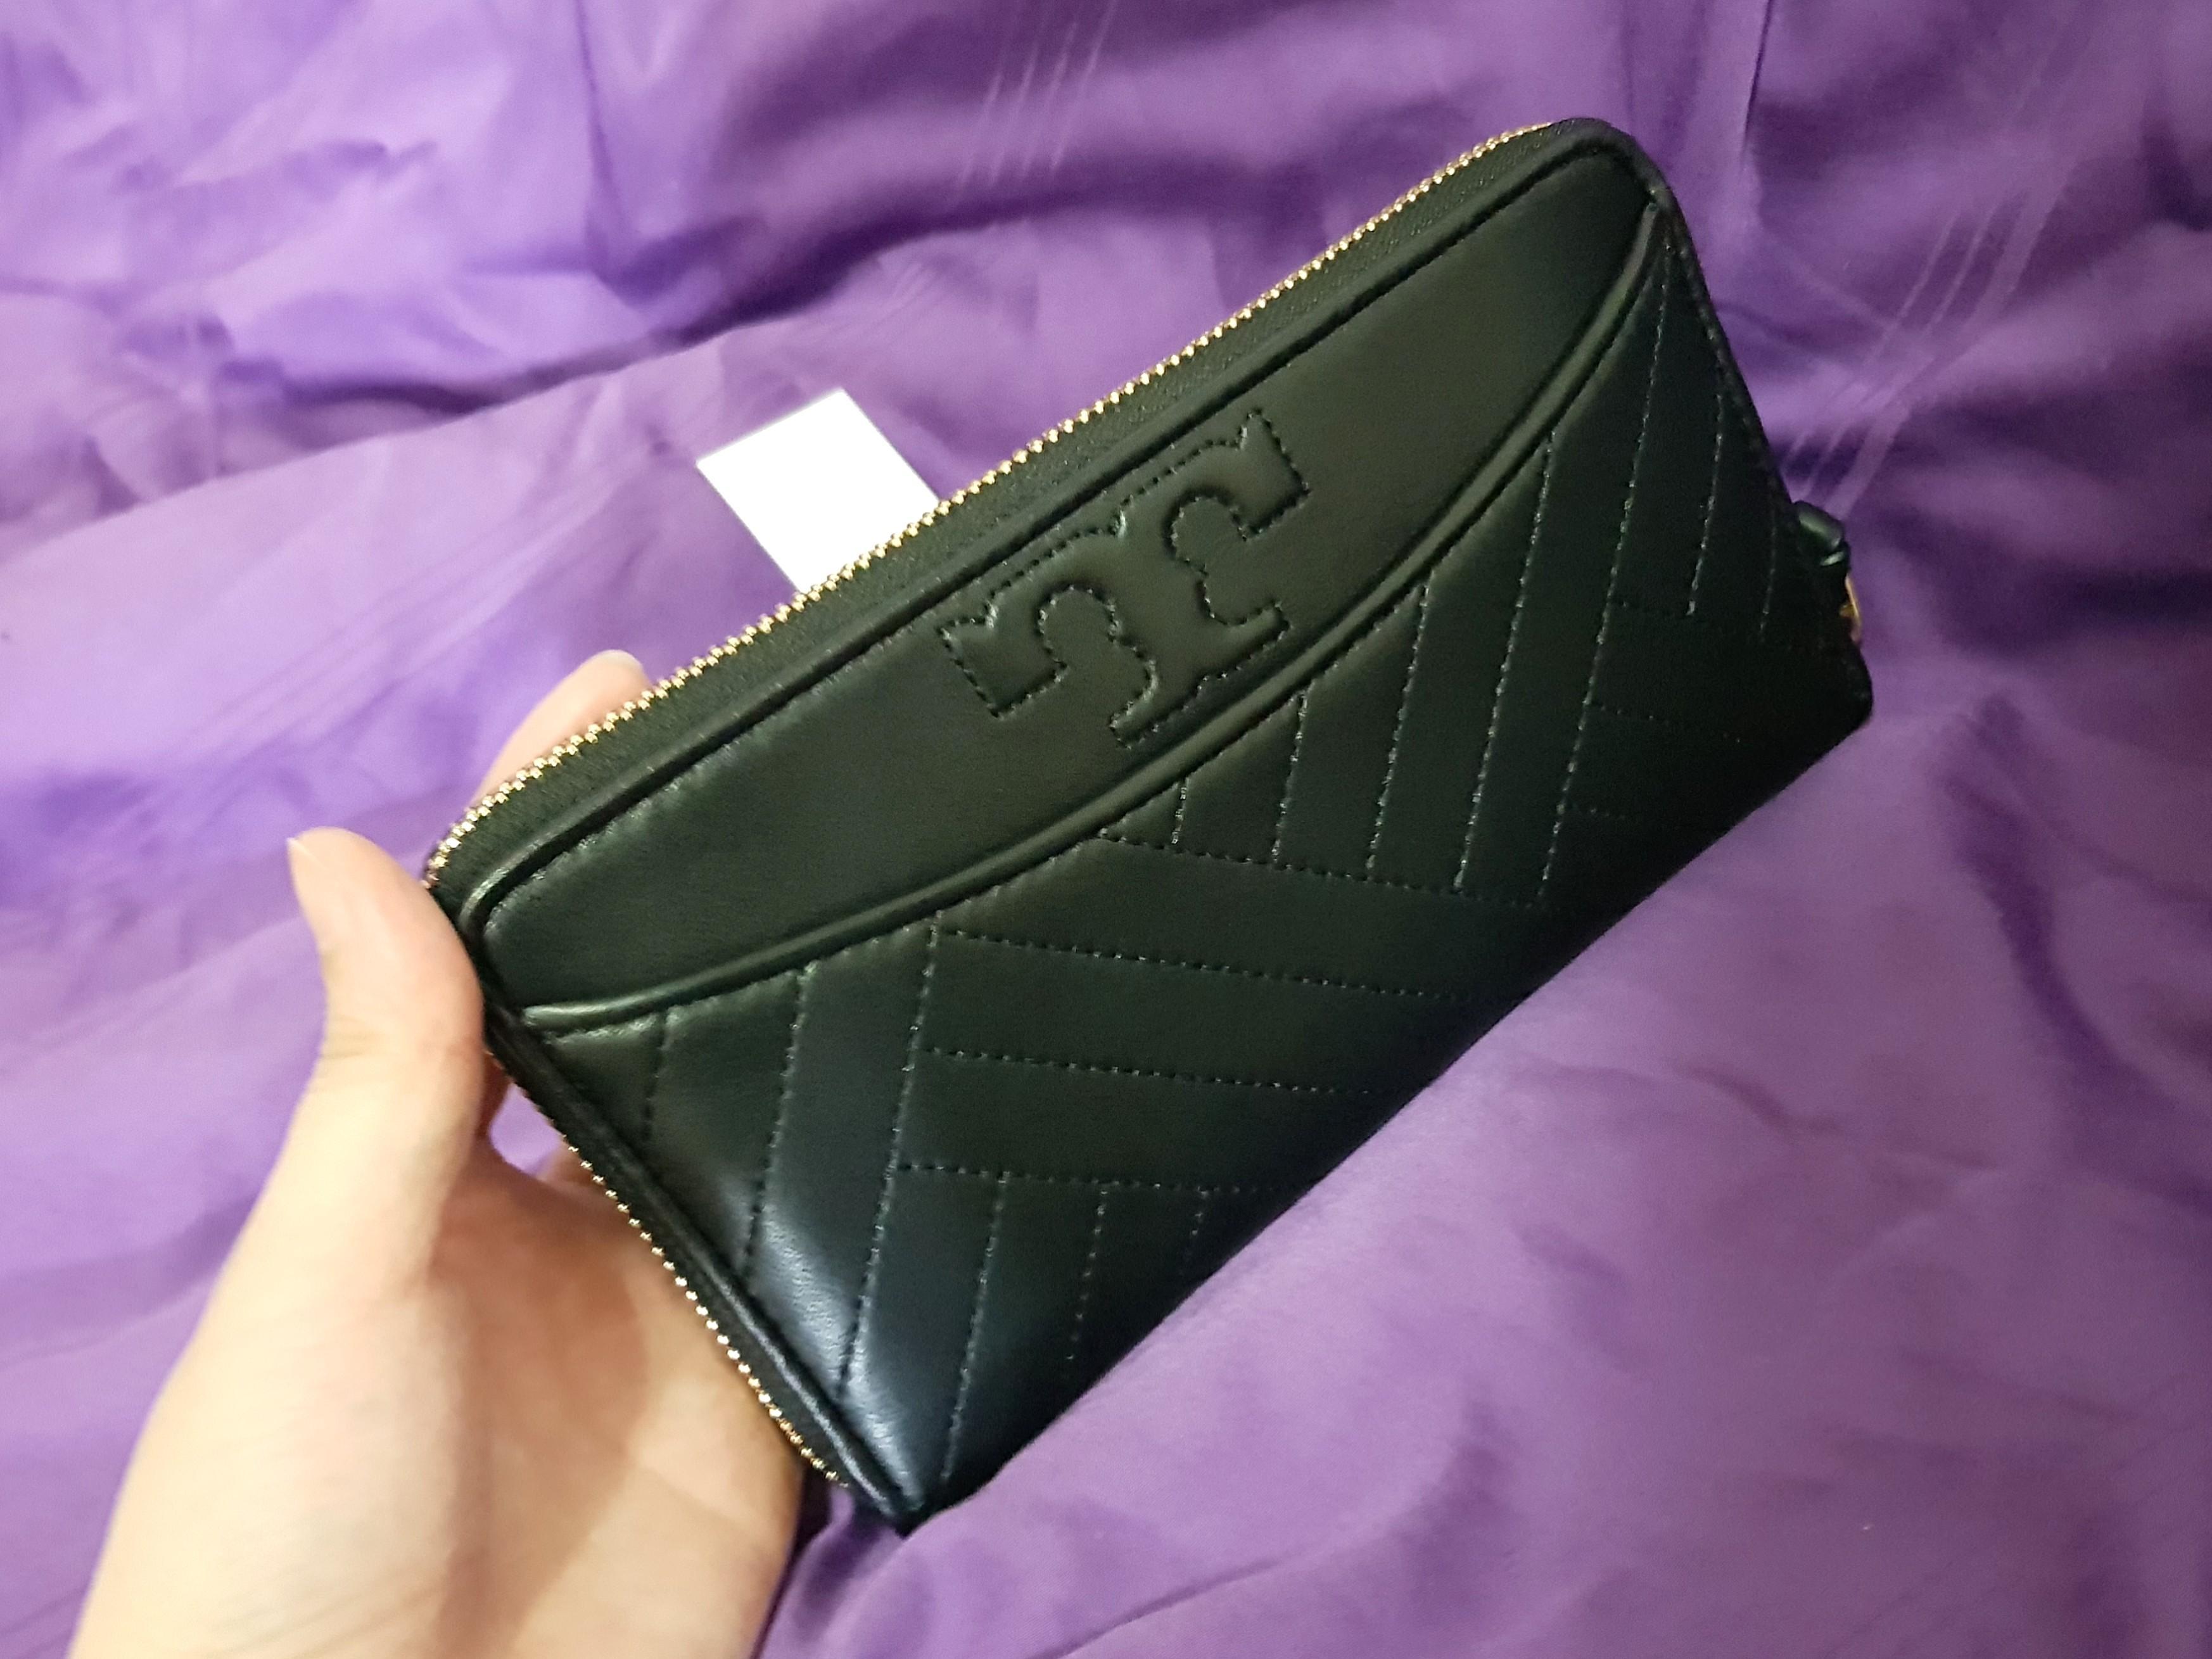 MOTHER'S DAY - 165 ONLY! Tory Burch Alexa Zip Continental Wallet - Black (INSTOCK) #EndgameYourExcess